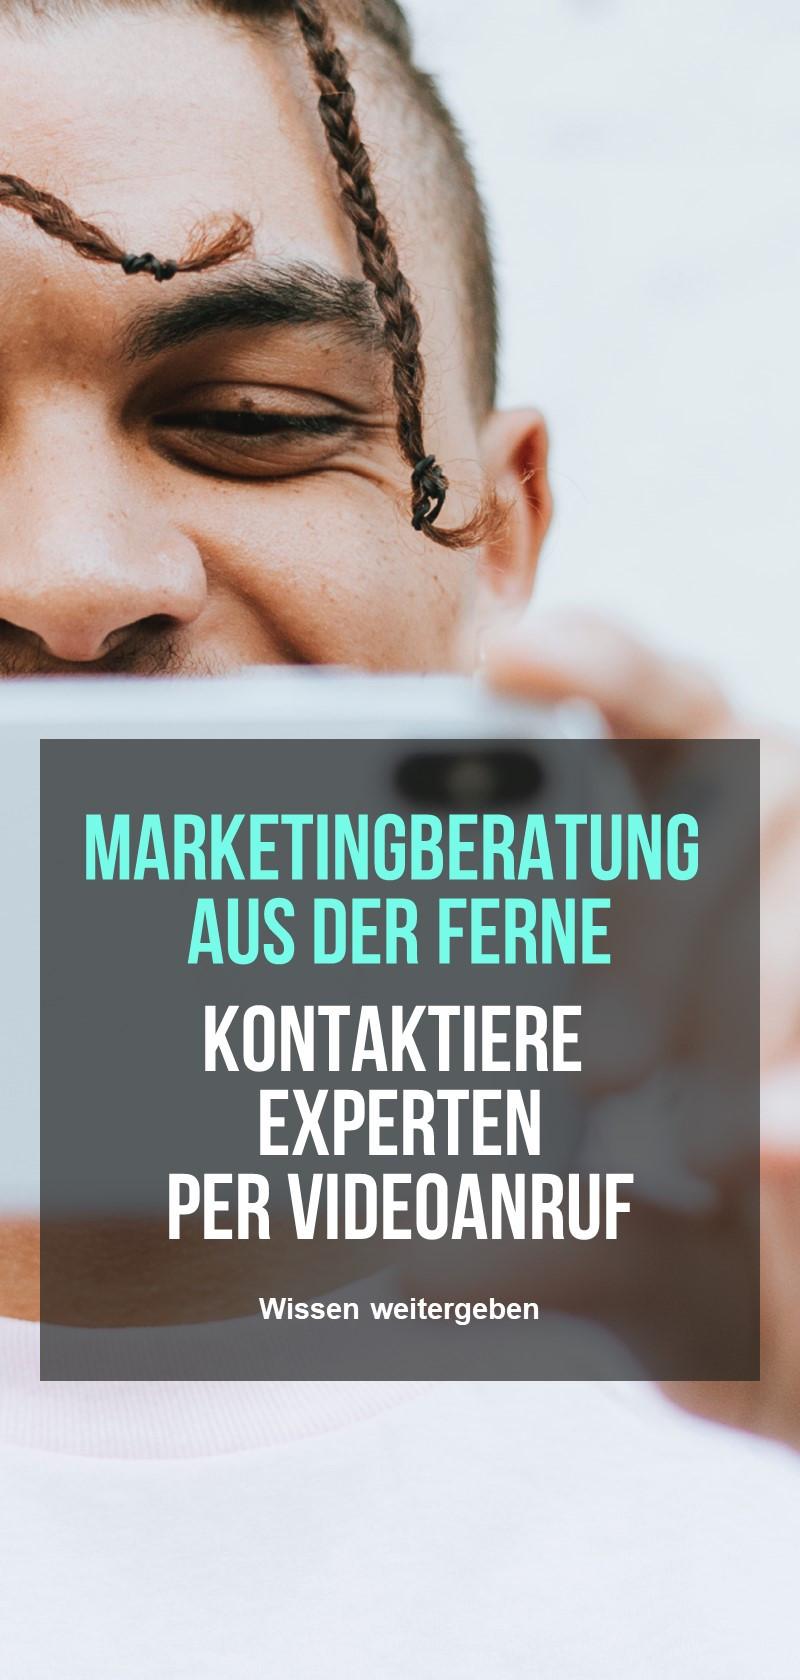 Marketingspezialisten